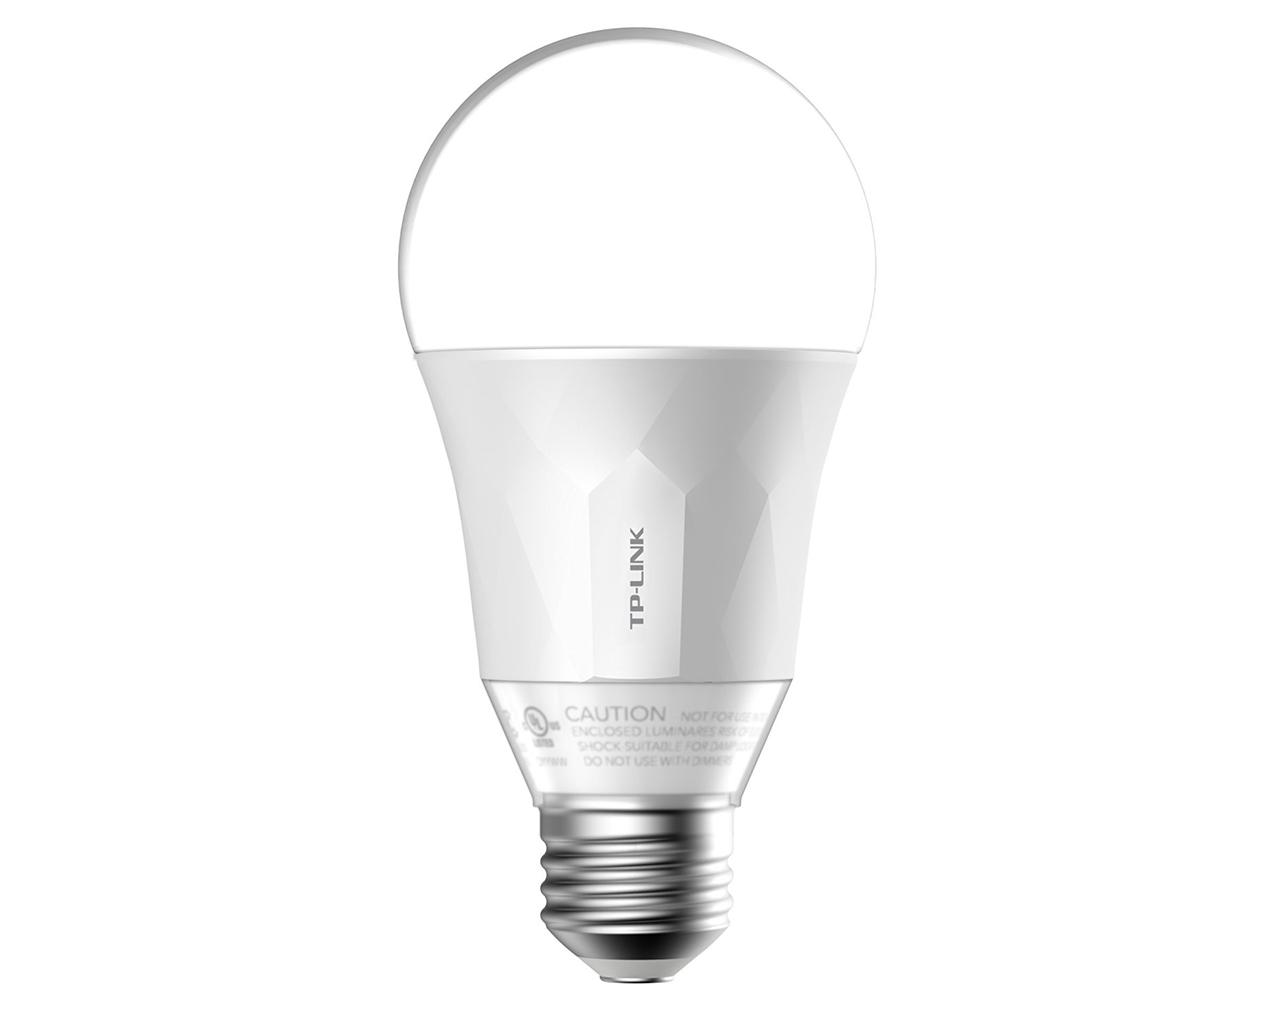 tp-link-smart-led-light-bulb